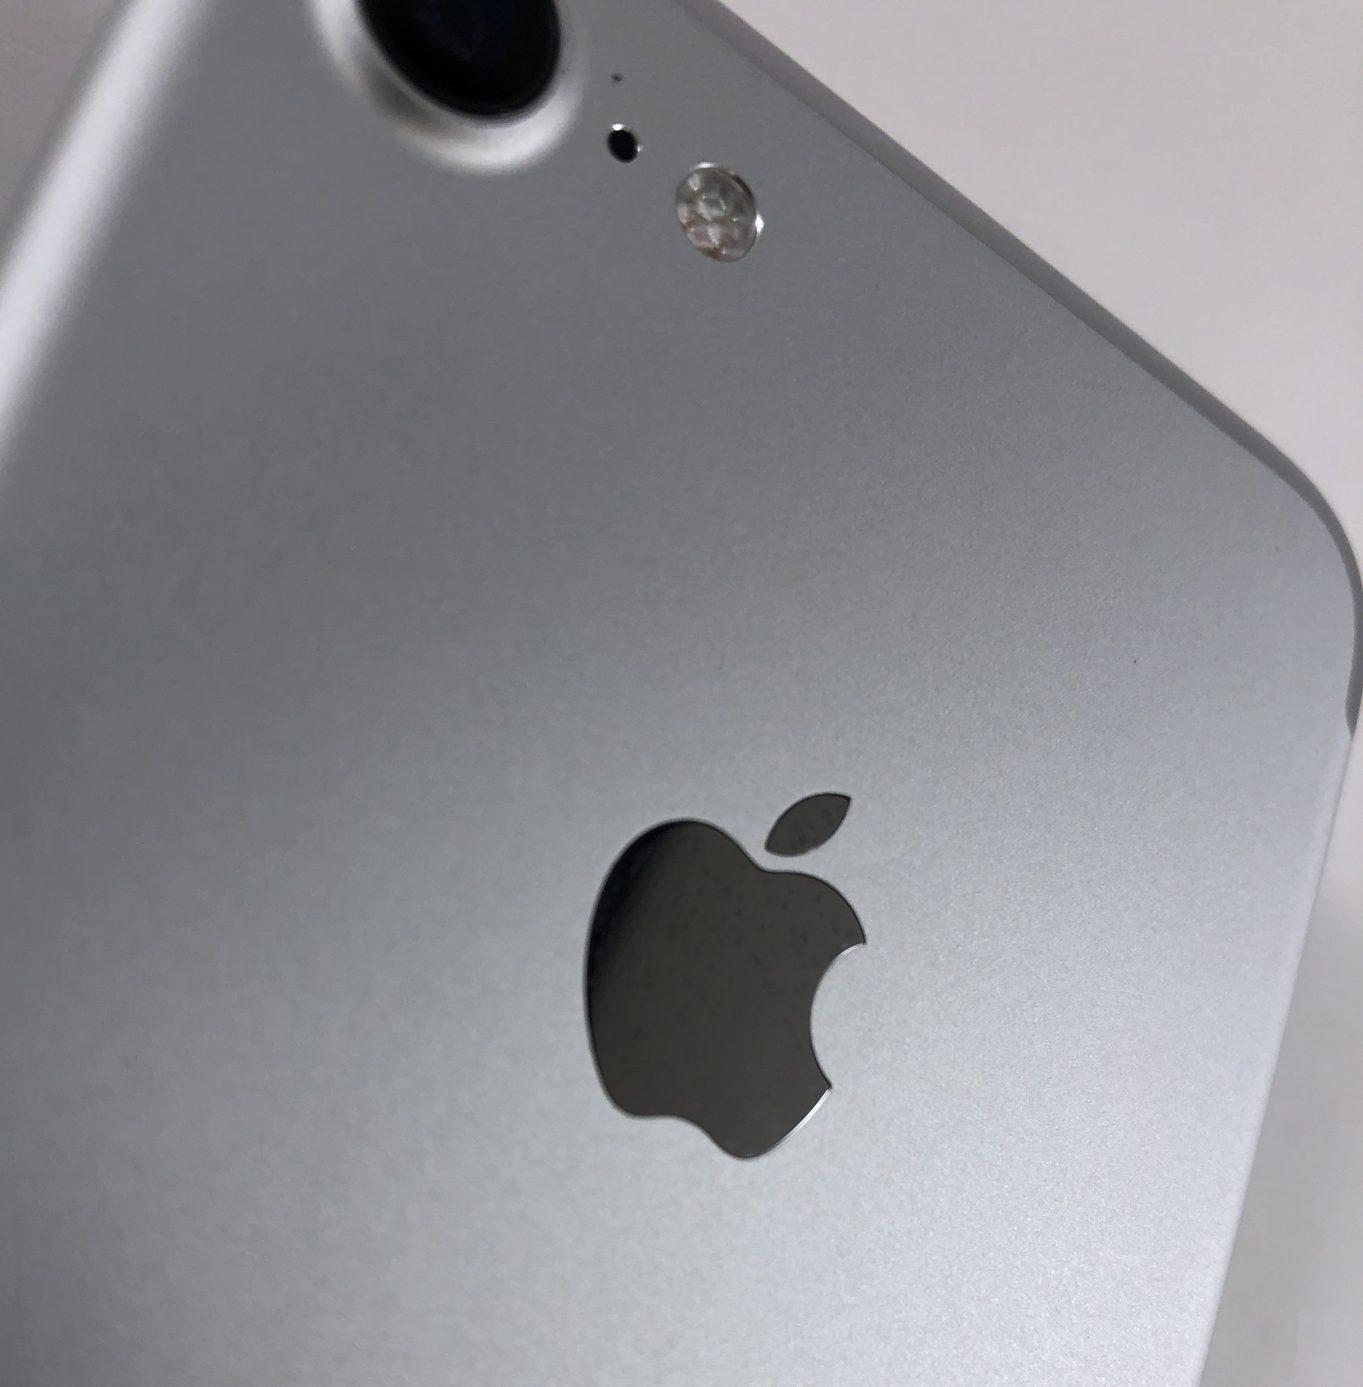 iPhone 7 128GB, 128GB, Silver, Afbeelding 3